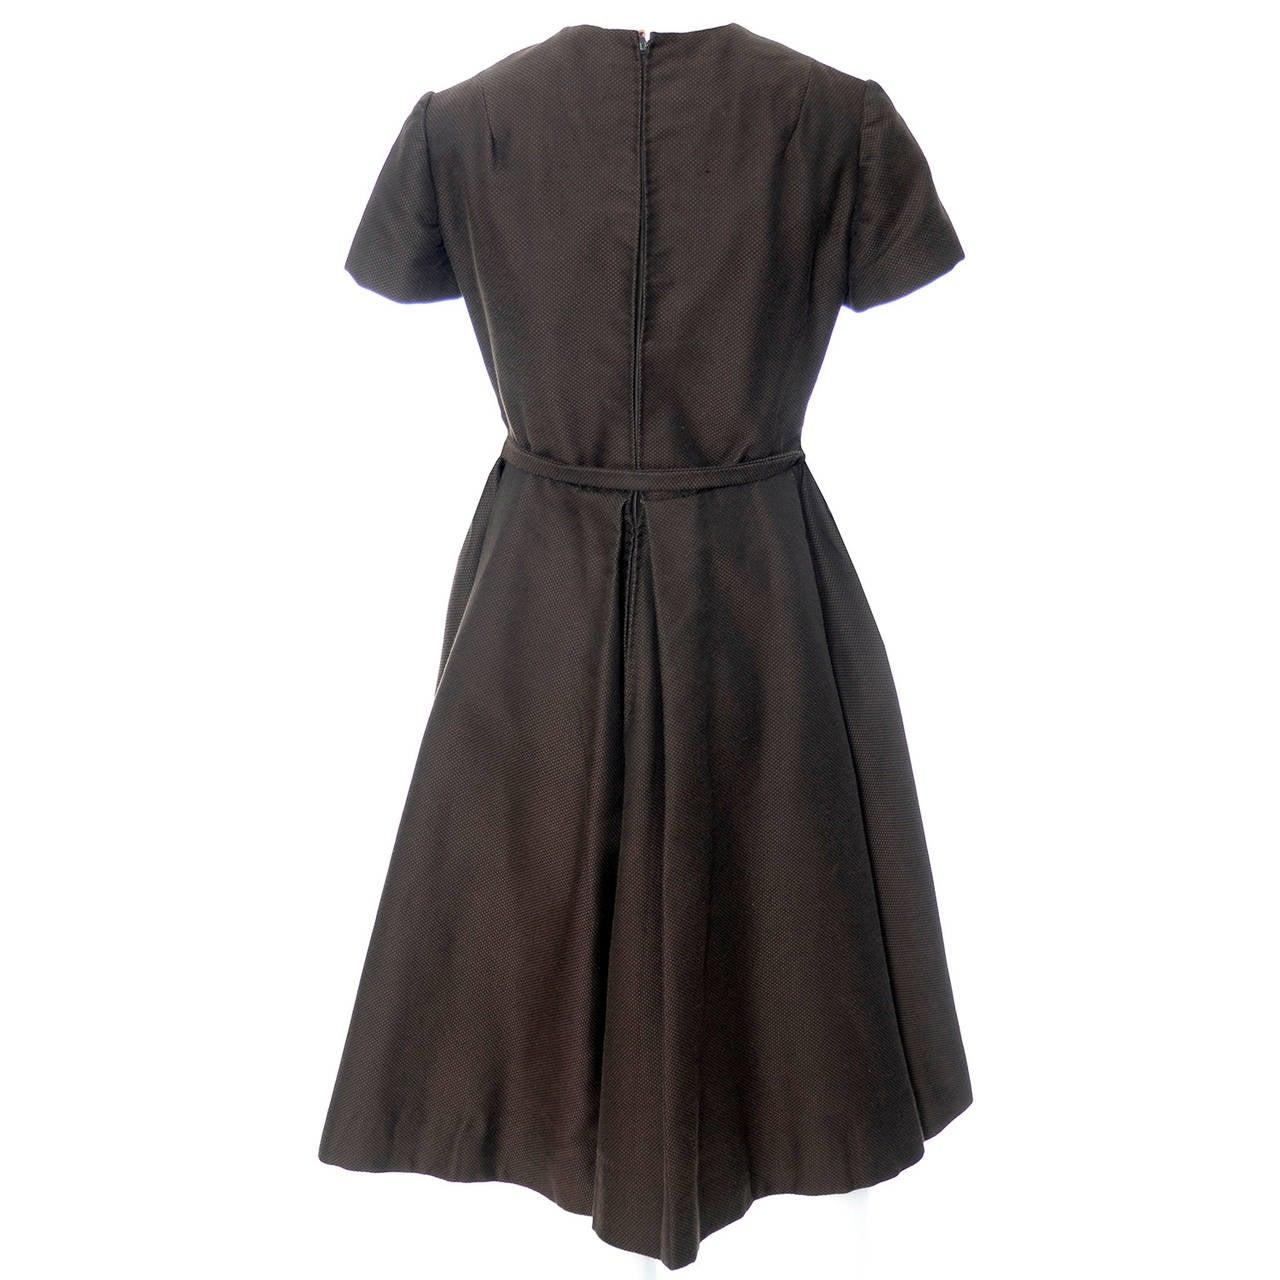 Chocolate Brown Geoffrey Beene 1960s Mod Vintage Dress Pockets Belt For Sale 2